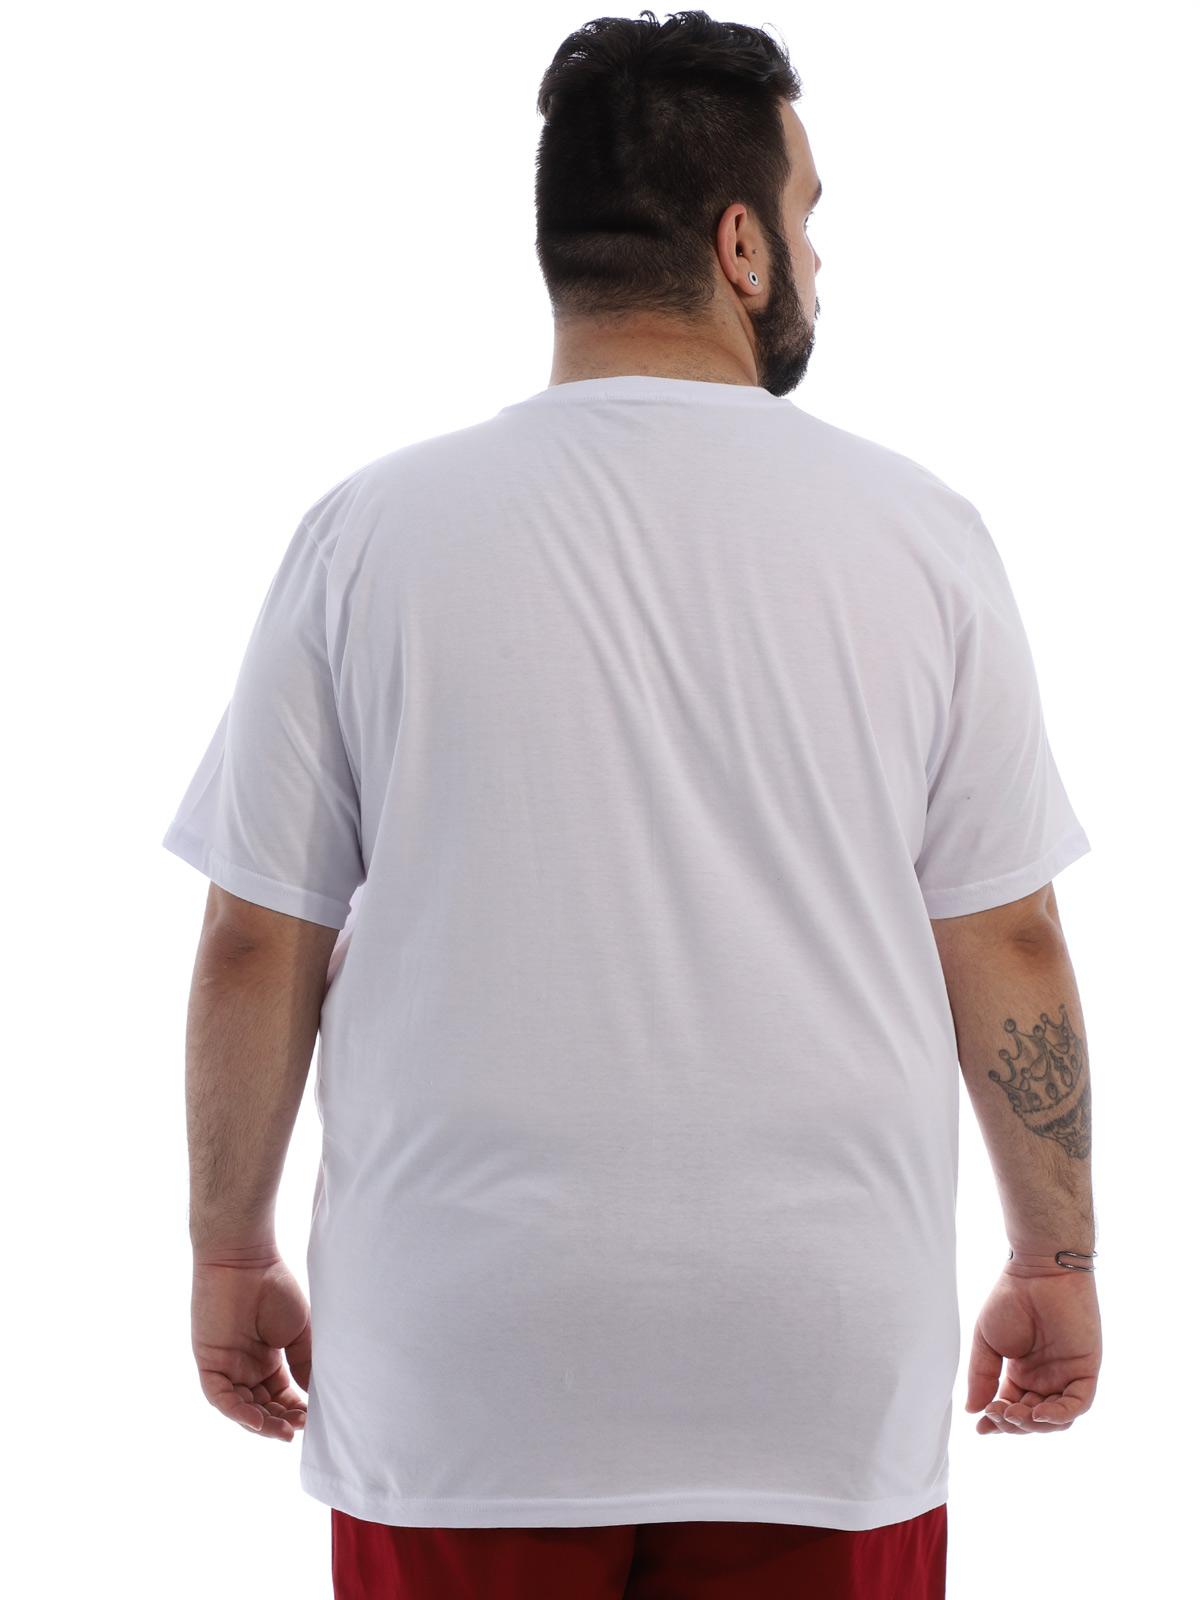 Camiseta Plus Size Lisa Masculino Básica Algodão Branca